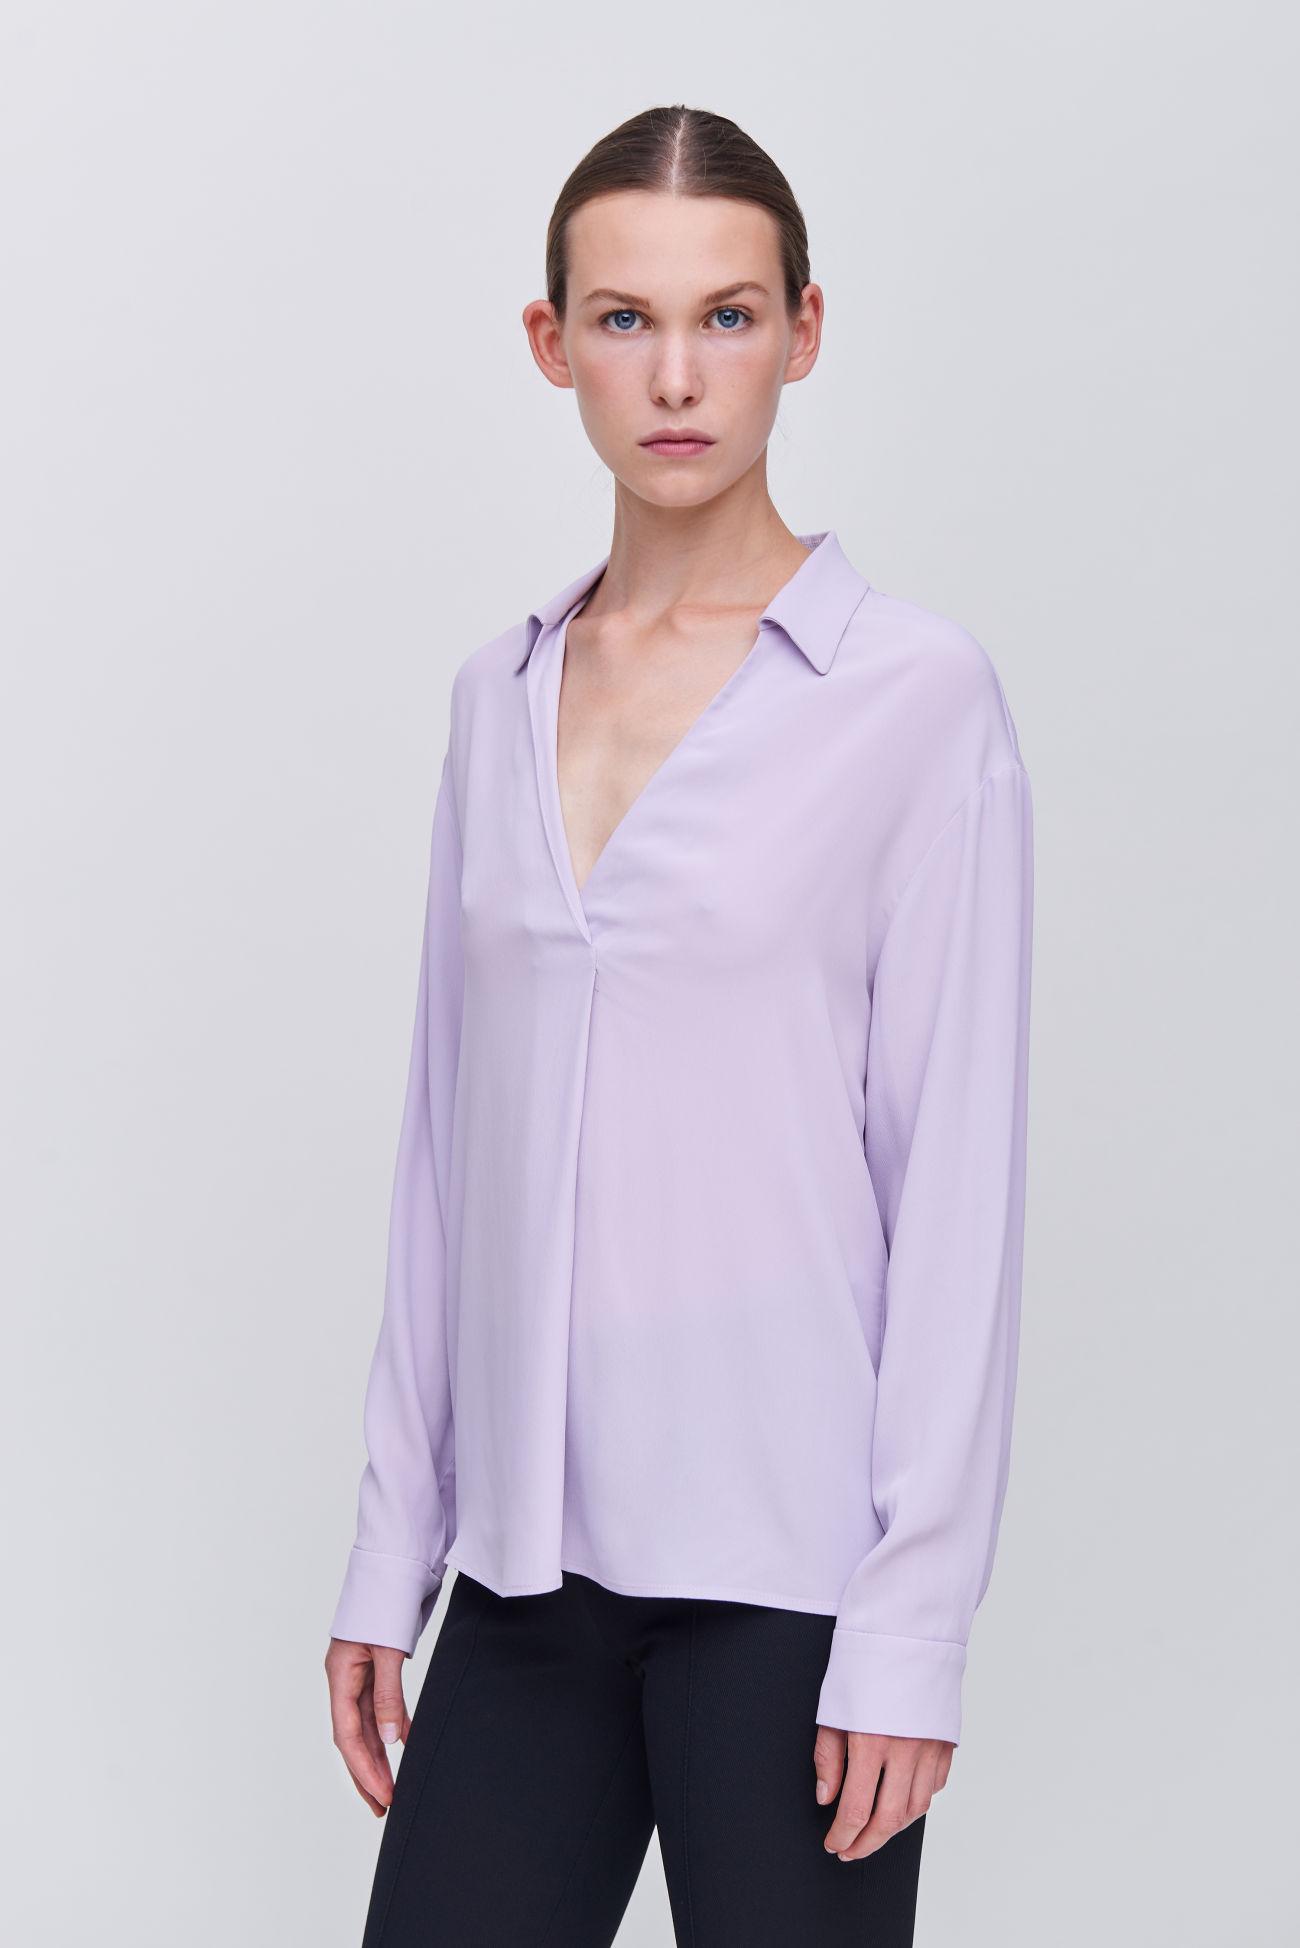 Flattering blouse shirt